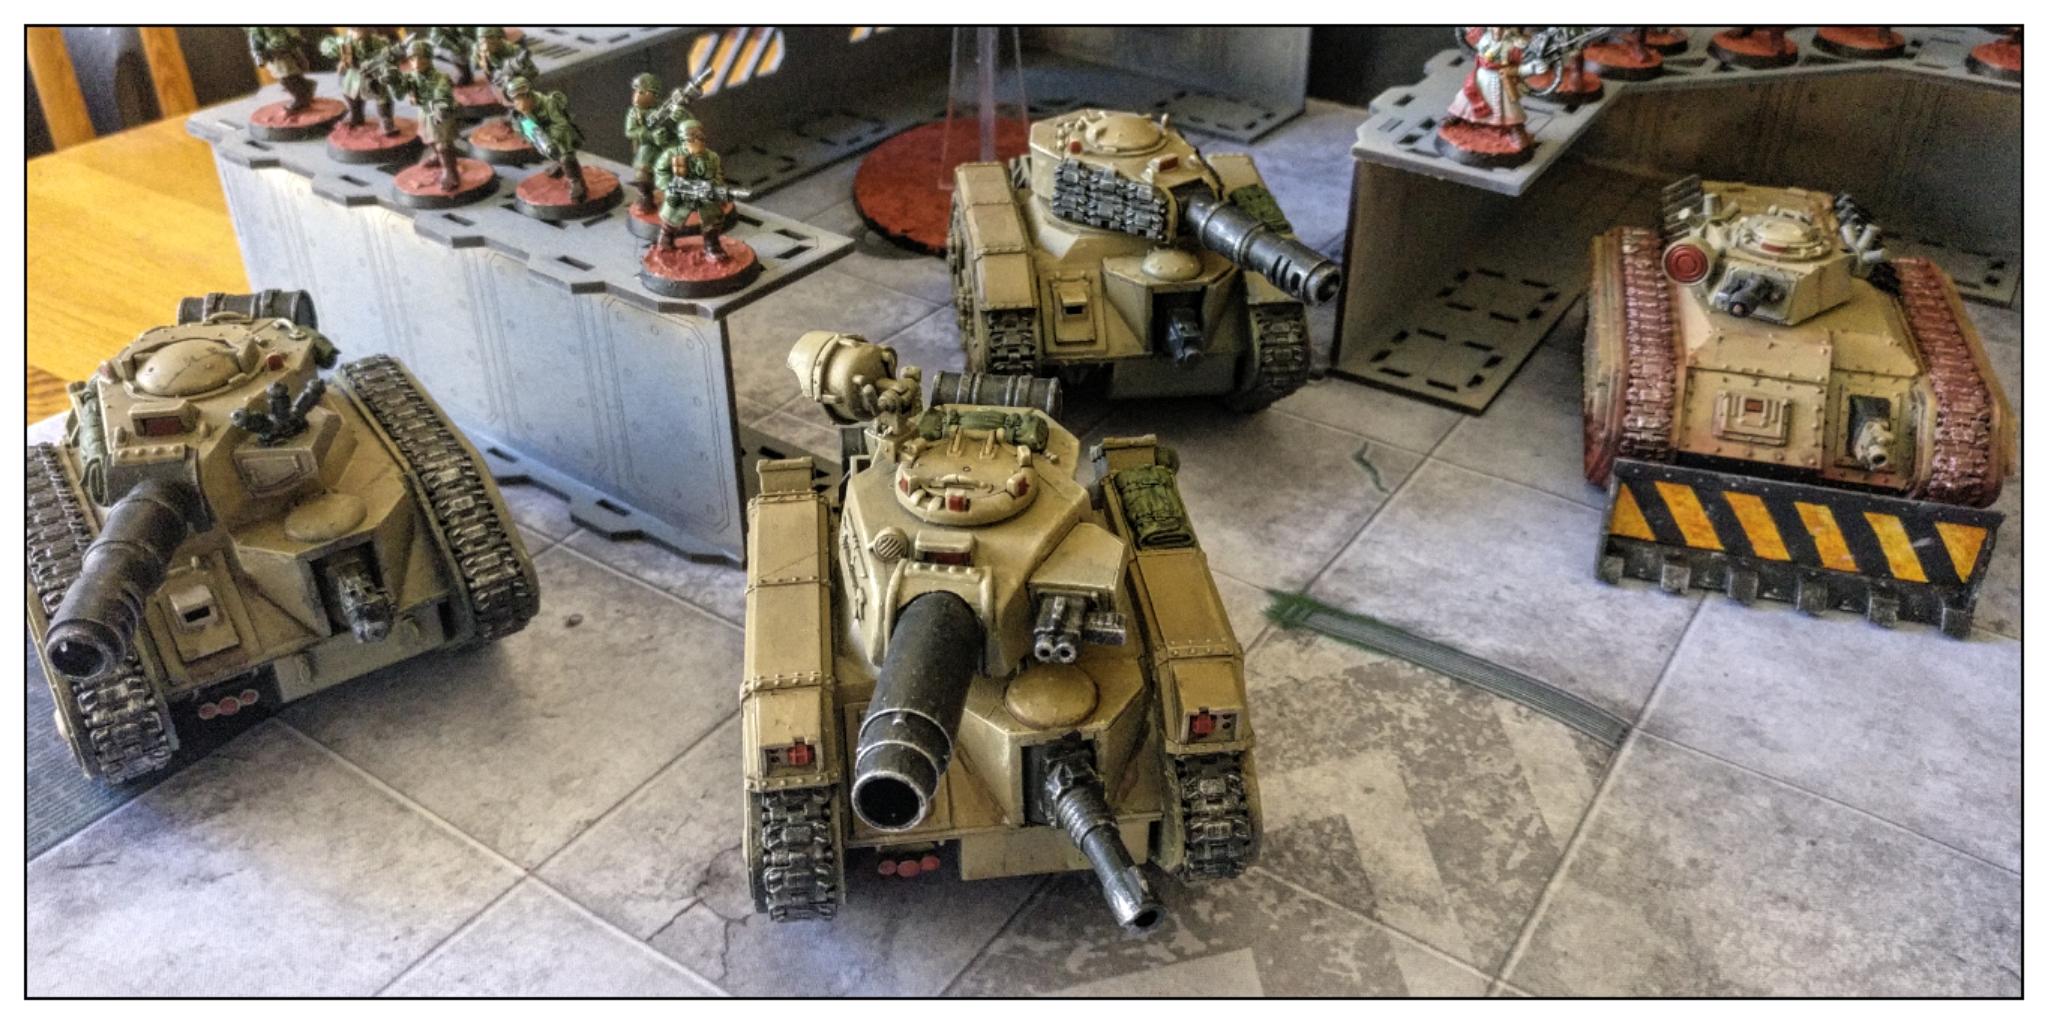 Imperial guard army - Astra Militarium - Leman Russes